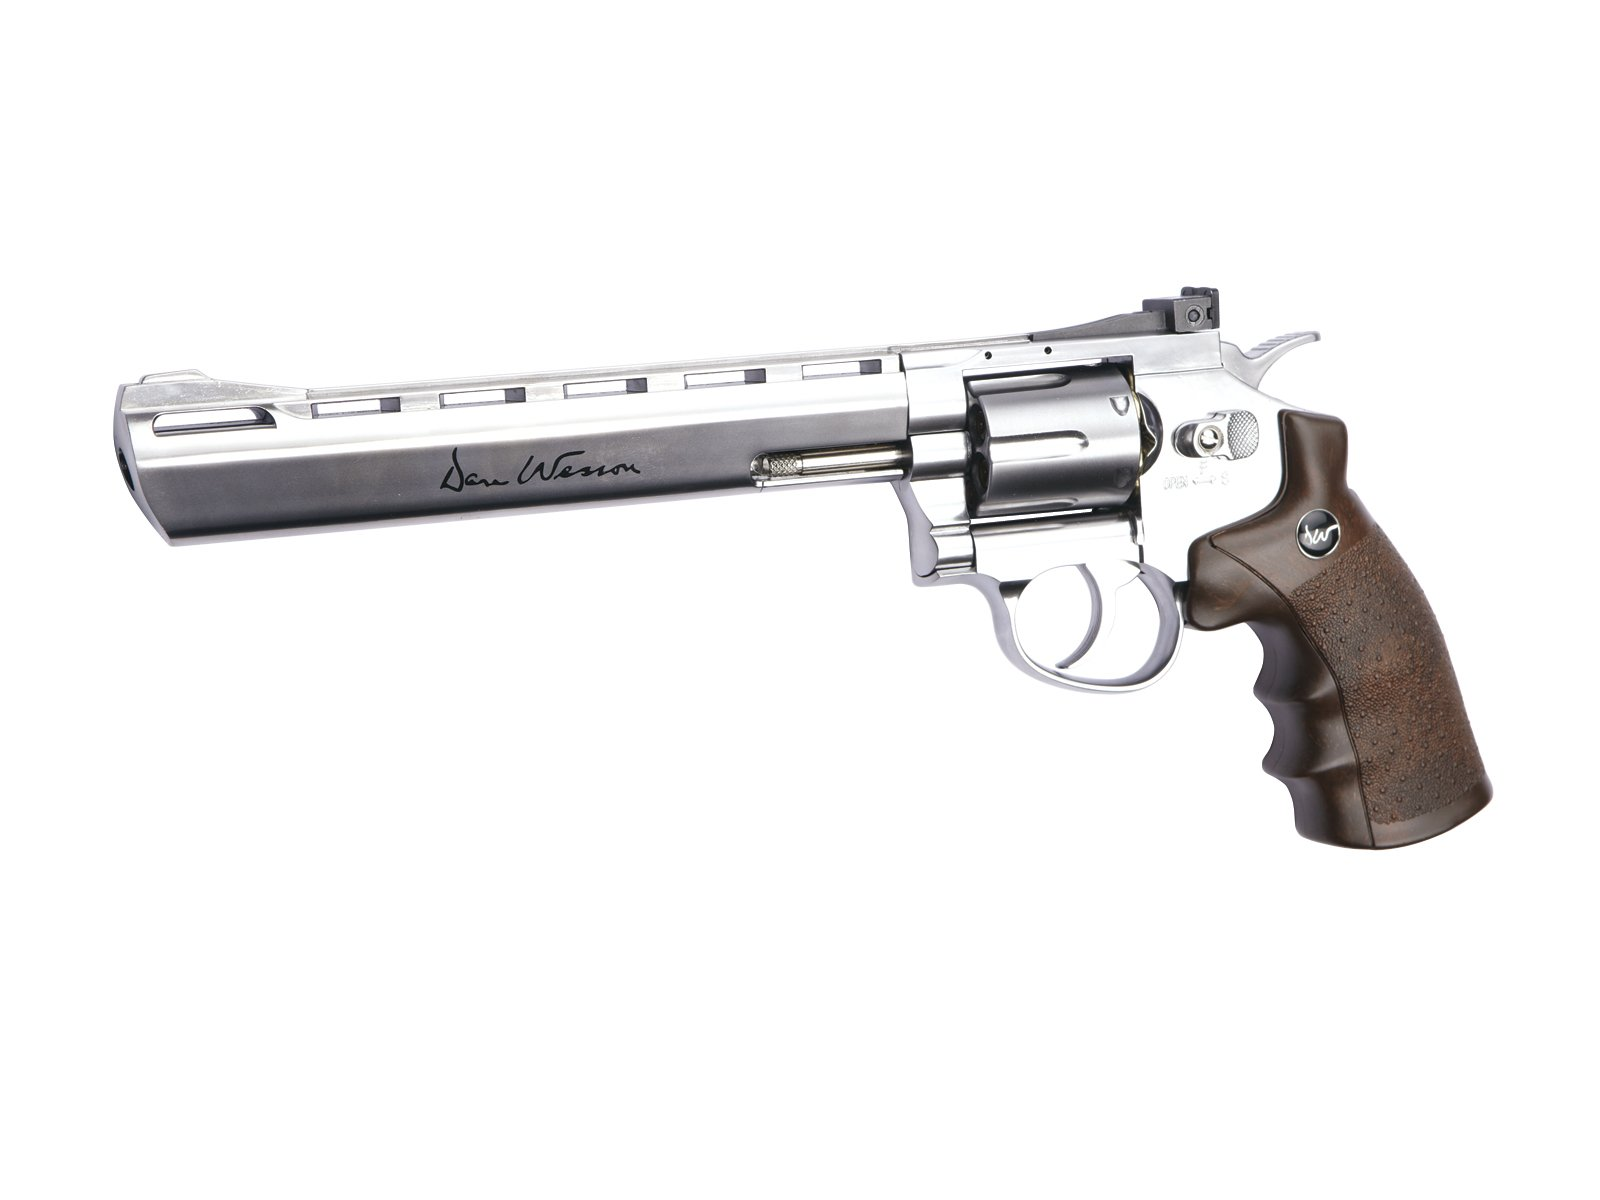 "ASG Dan Wesson 8"" CO2 Powered Airgun Revolver"